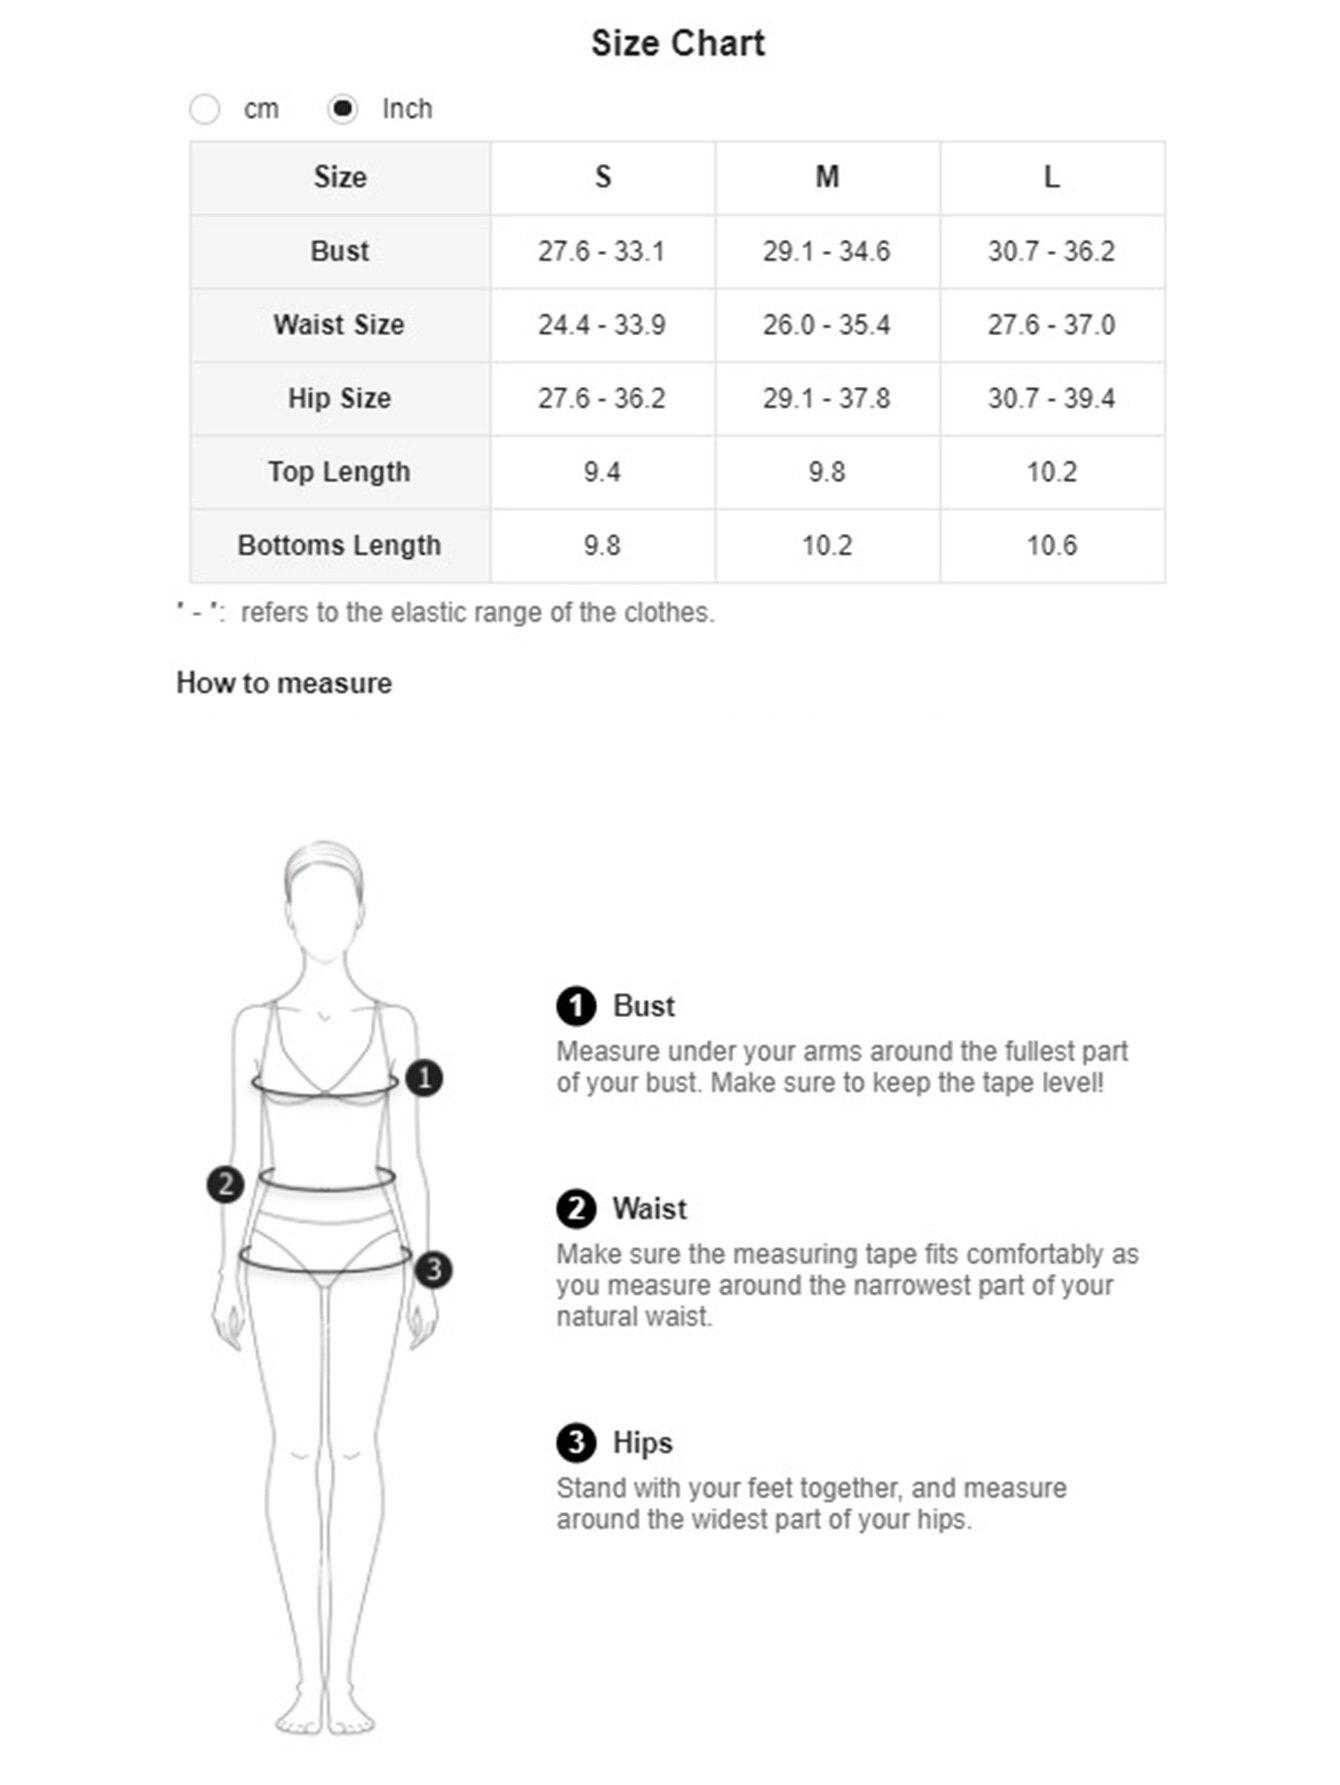 SweatyRocks Women's Sexy Bikini Swimsuit Floral Print Tie Knot Front Swimwear Set Multi M by SweatyRocks (Image #6)